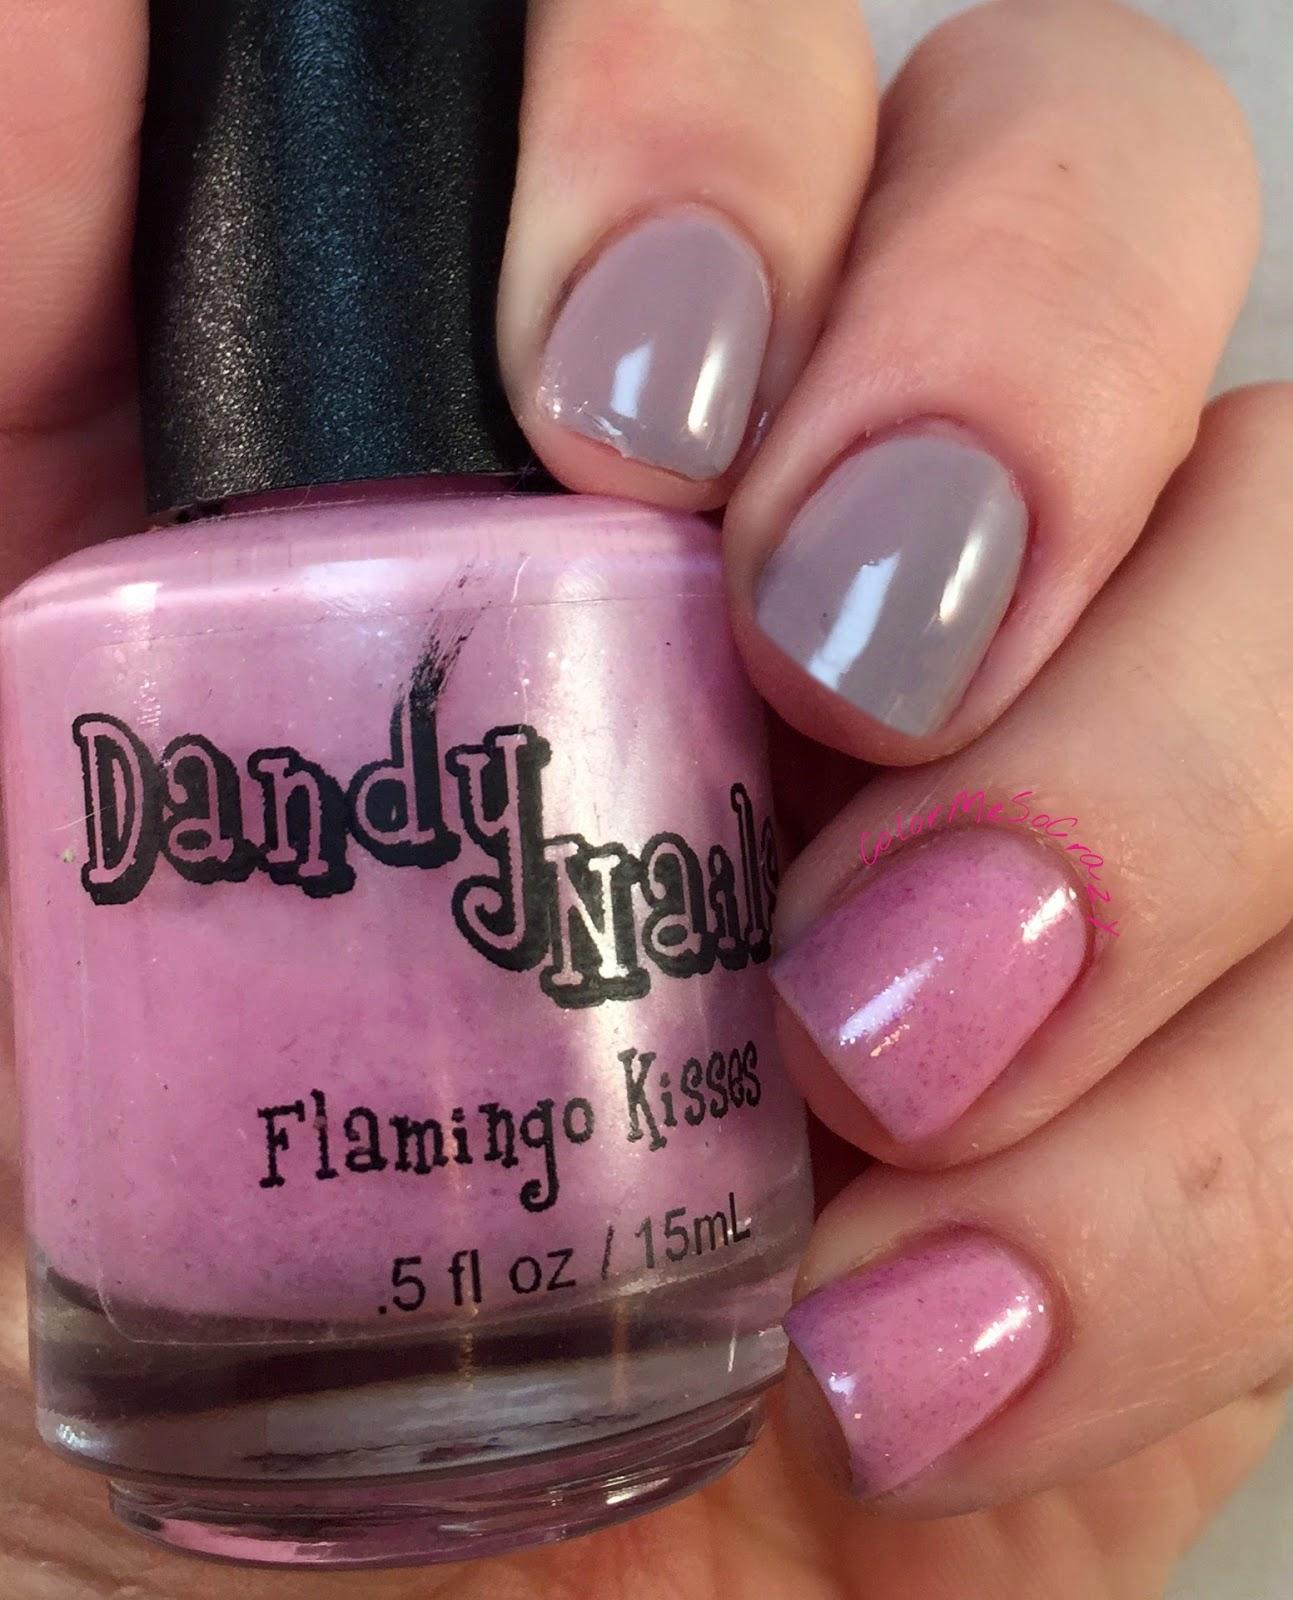 dandy nails- flamingo kisses- sandy hook polish- indie polish- dance legend- thermal polish- trio no 3- skittle nails